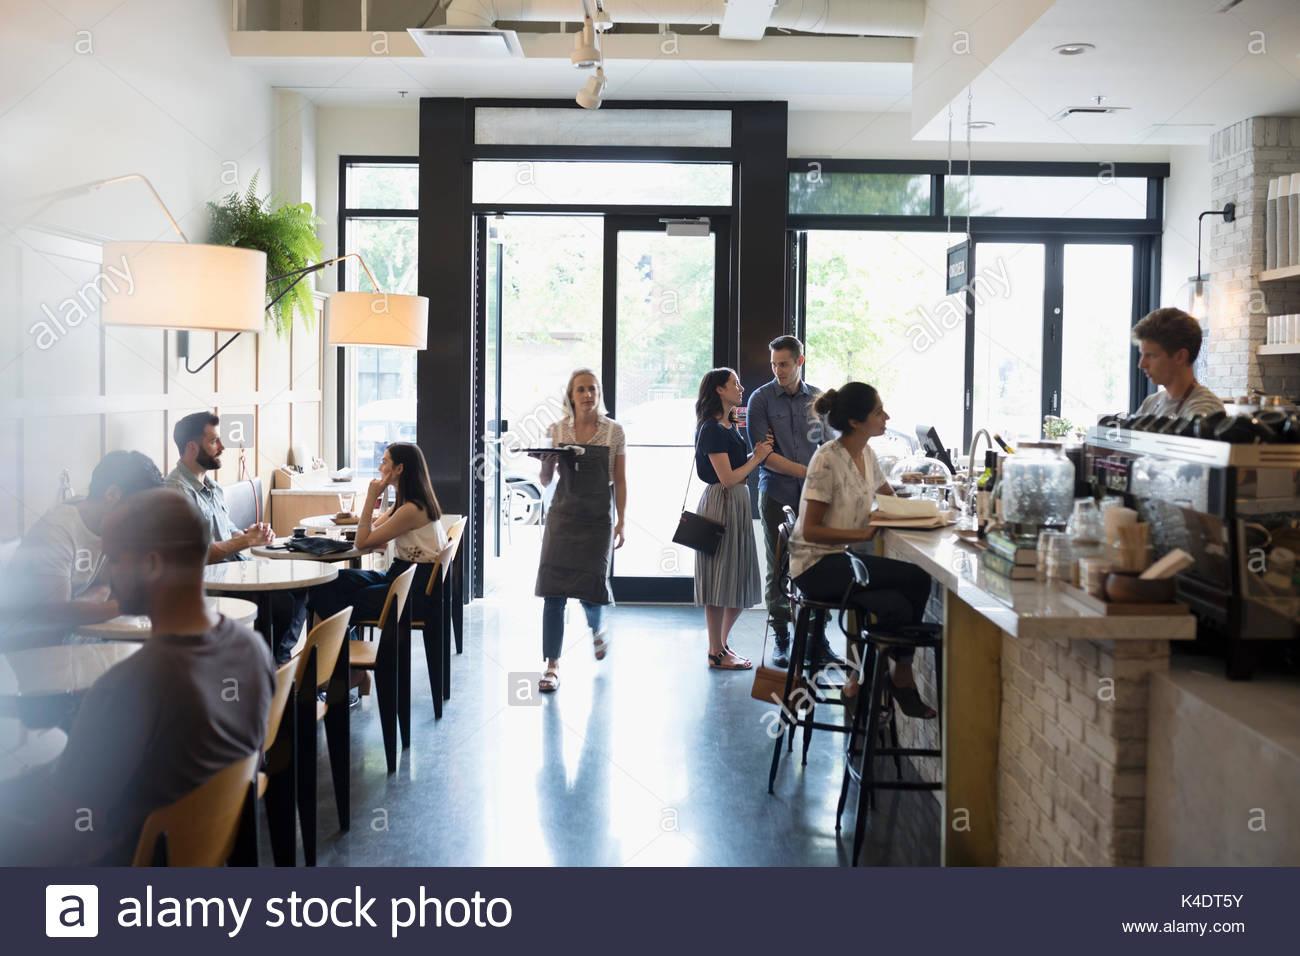 Kellnerin und Kunden im Cafe Stockbild